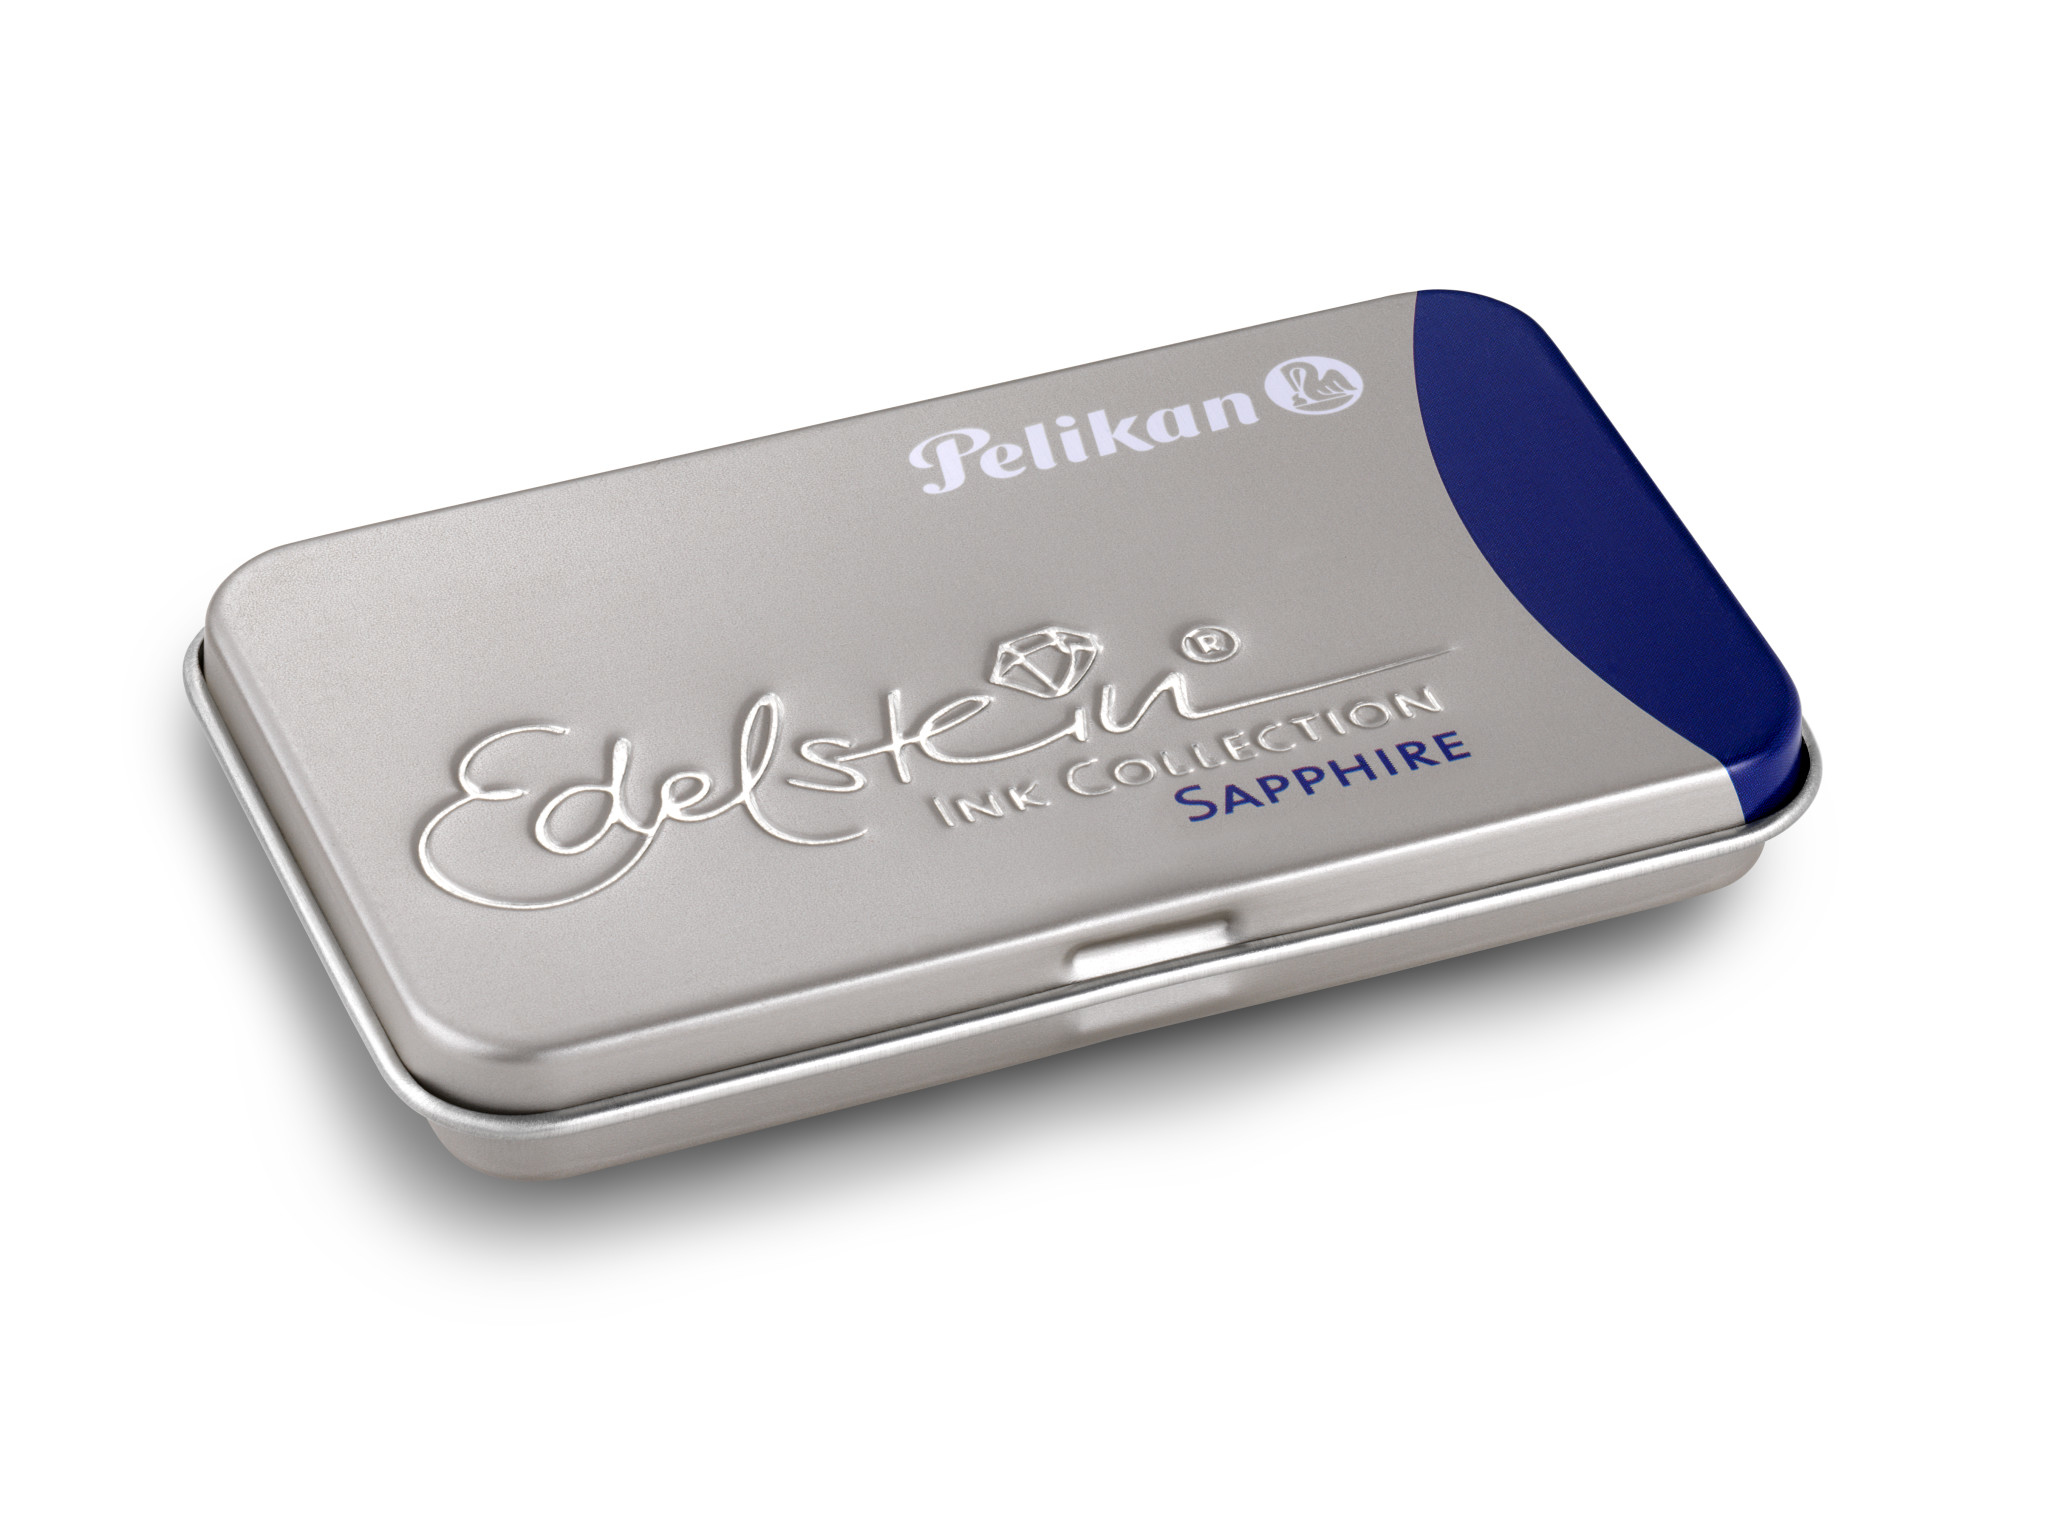 Pelikan 339630 - Blau - Blau - Silber - Füllfederhalter - Deutschland - Box - 6 Stück(e)